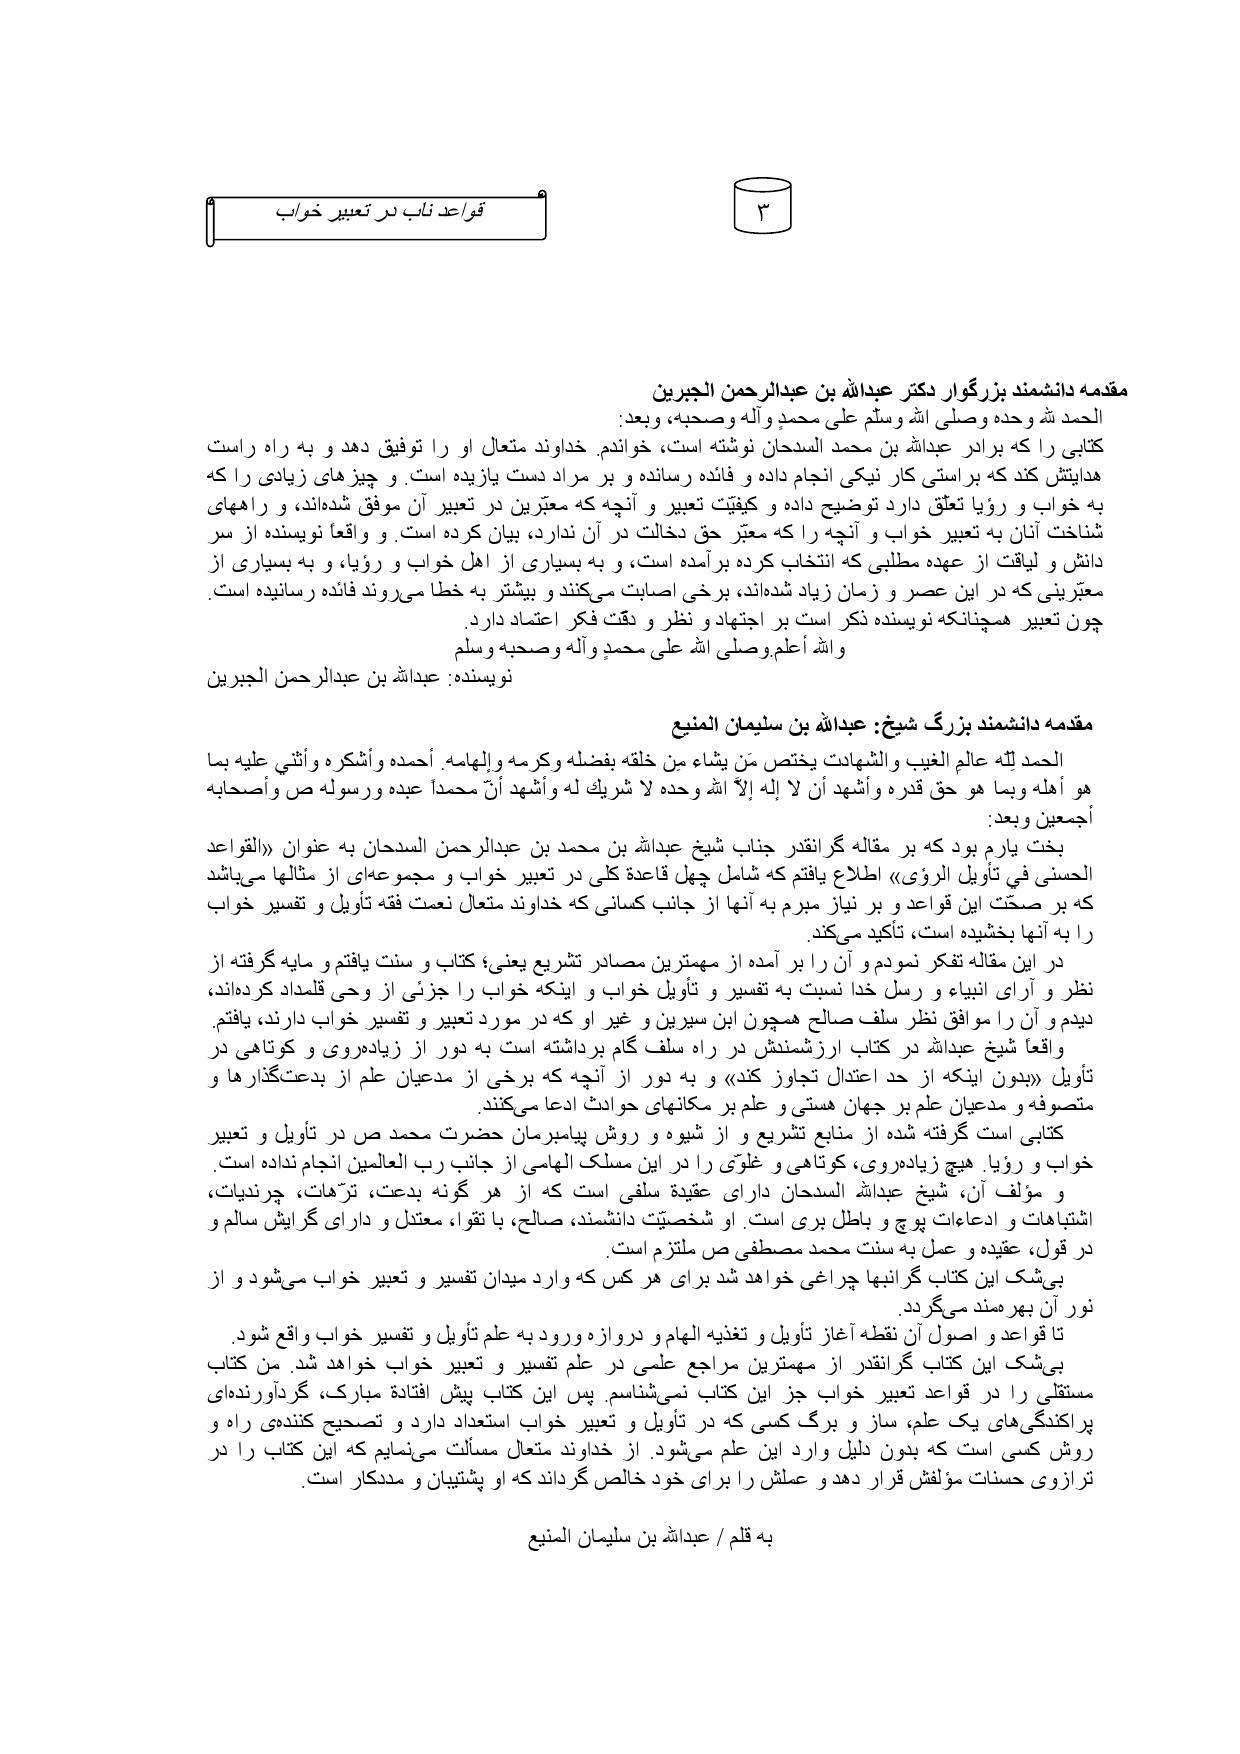 ghavaed_tabir_khab_ebook.VeyQ.[www.yasbooks.com]_000002